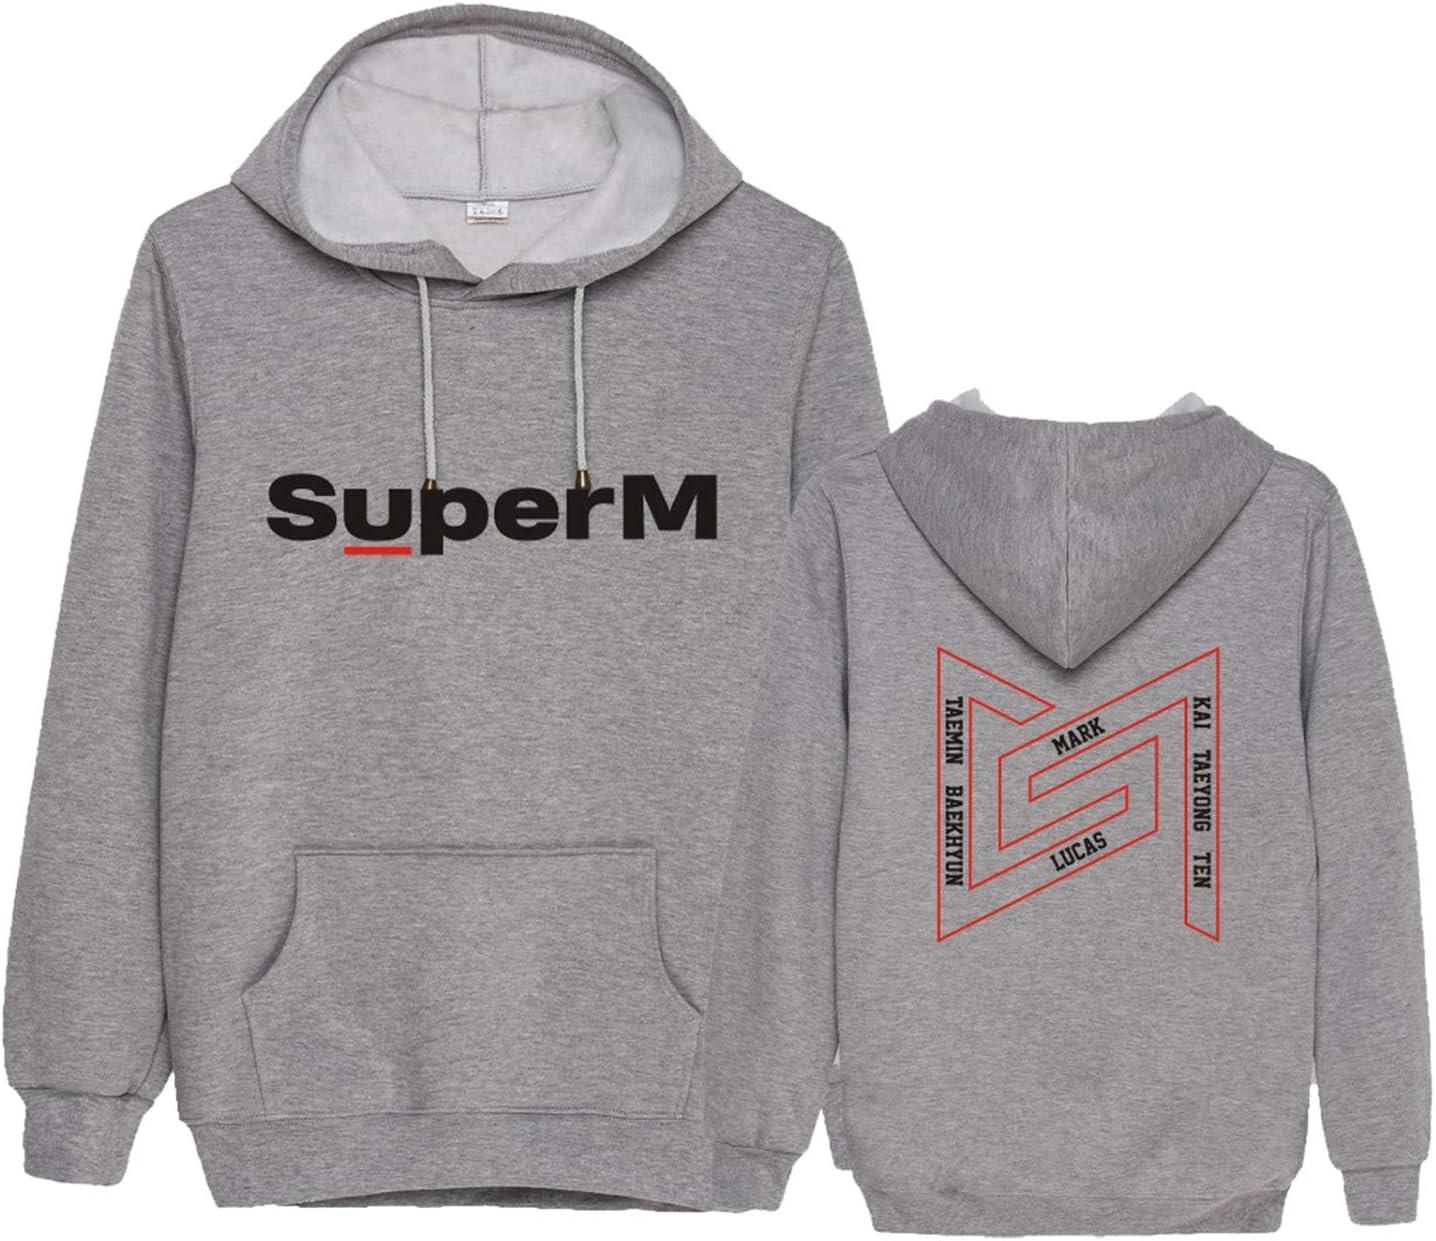 Dolpind Kpop SuperM Hoodie Baekhyun Taemin Taeyong Kai Ten Mark Lucas Sweatshirt Merchandise